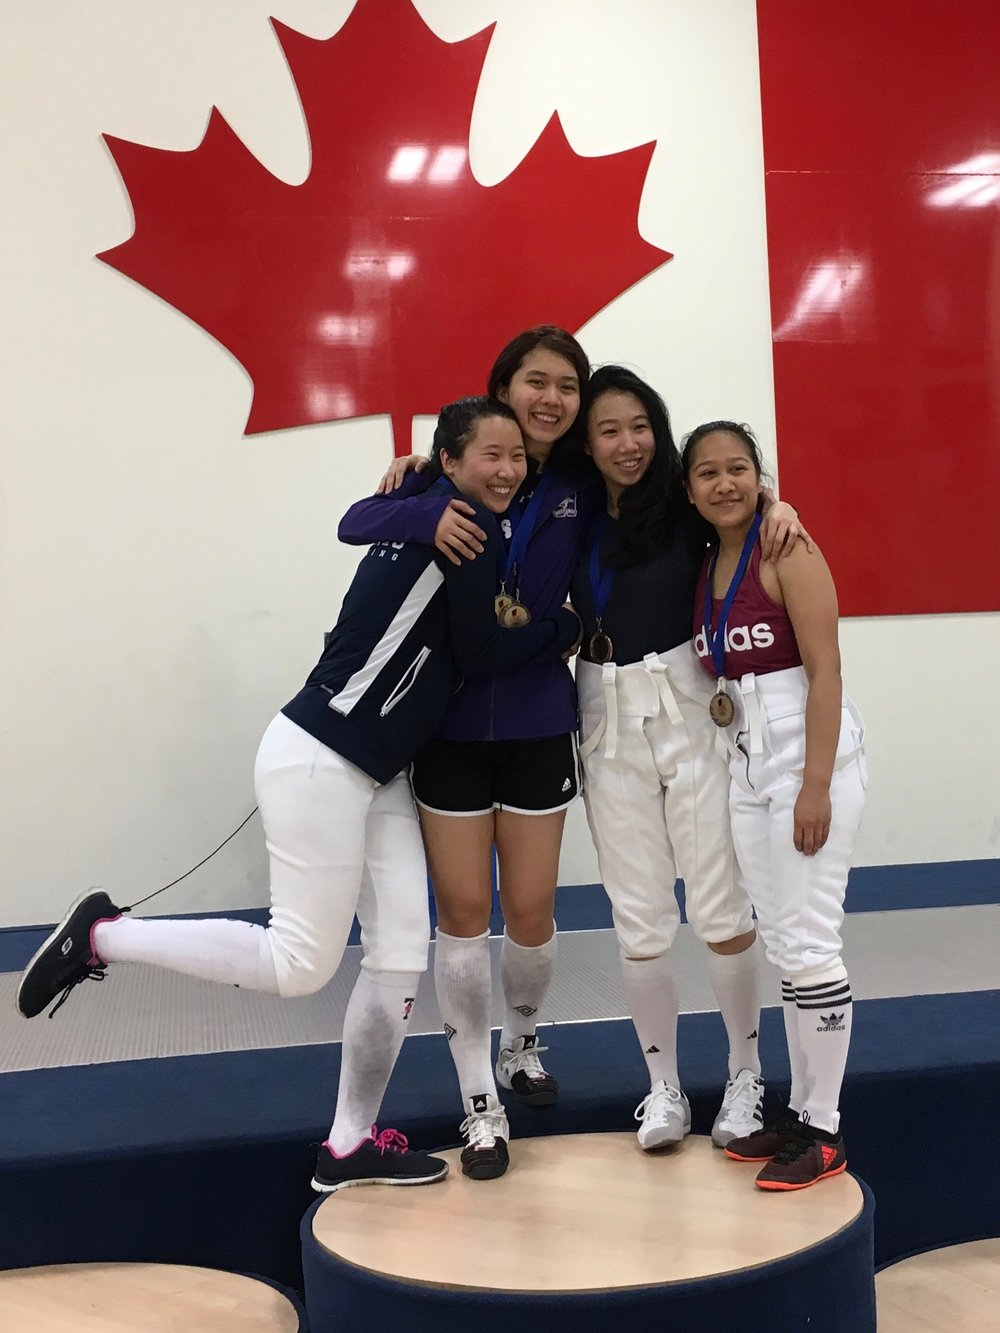 Vango UWS Linda Huang 2, Daphne Huang 1, Cindy Su 3, Kathleen Villalba 3.jpg